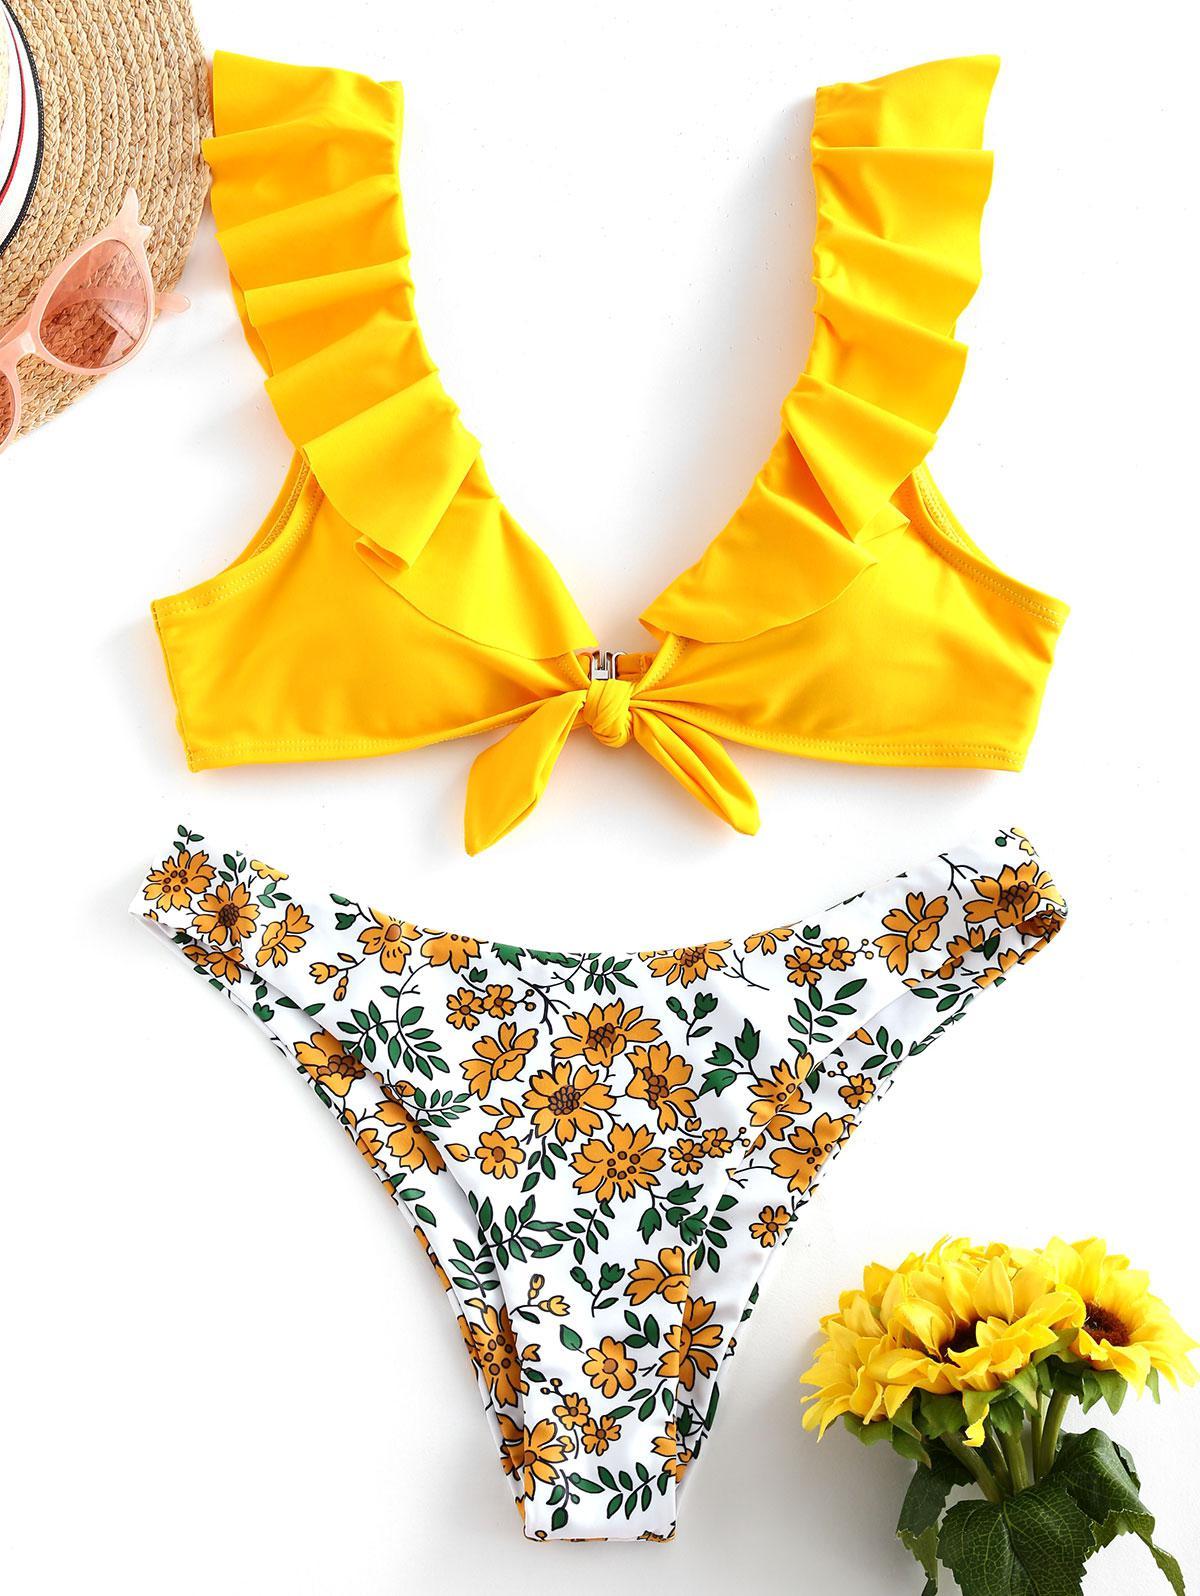 ZAFUL Flower Ruffle Tied High Leg Bikini Swimsuit фото